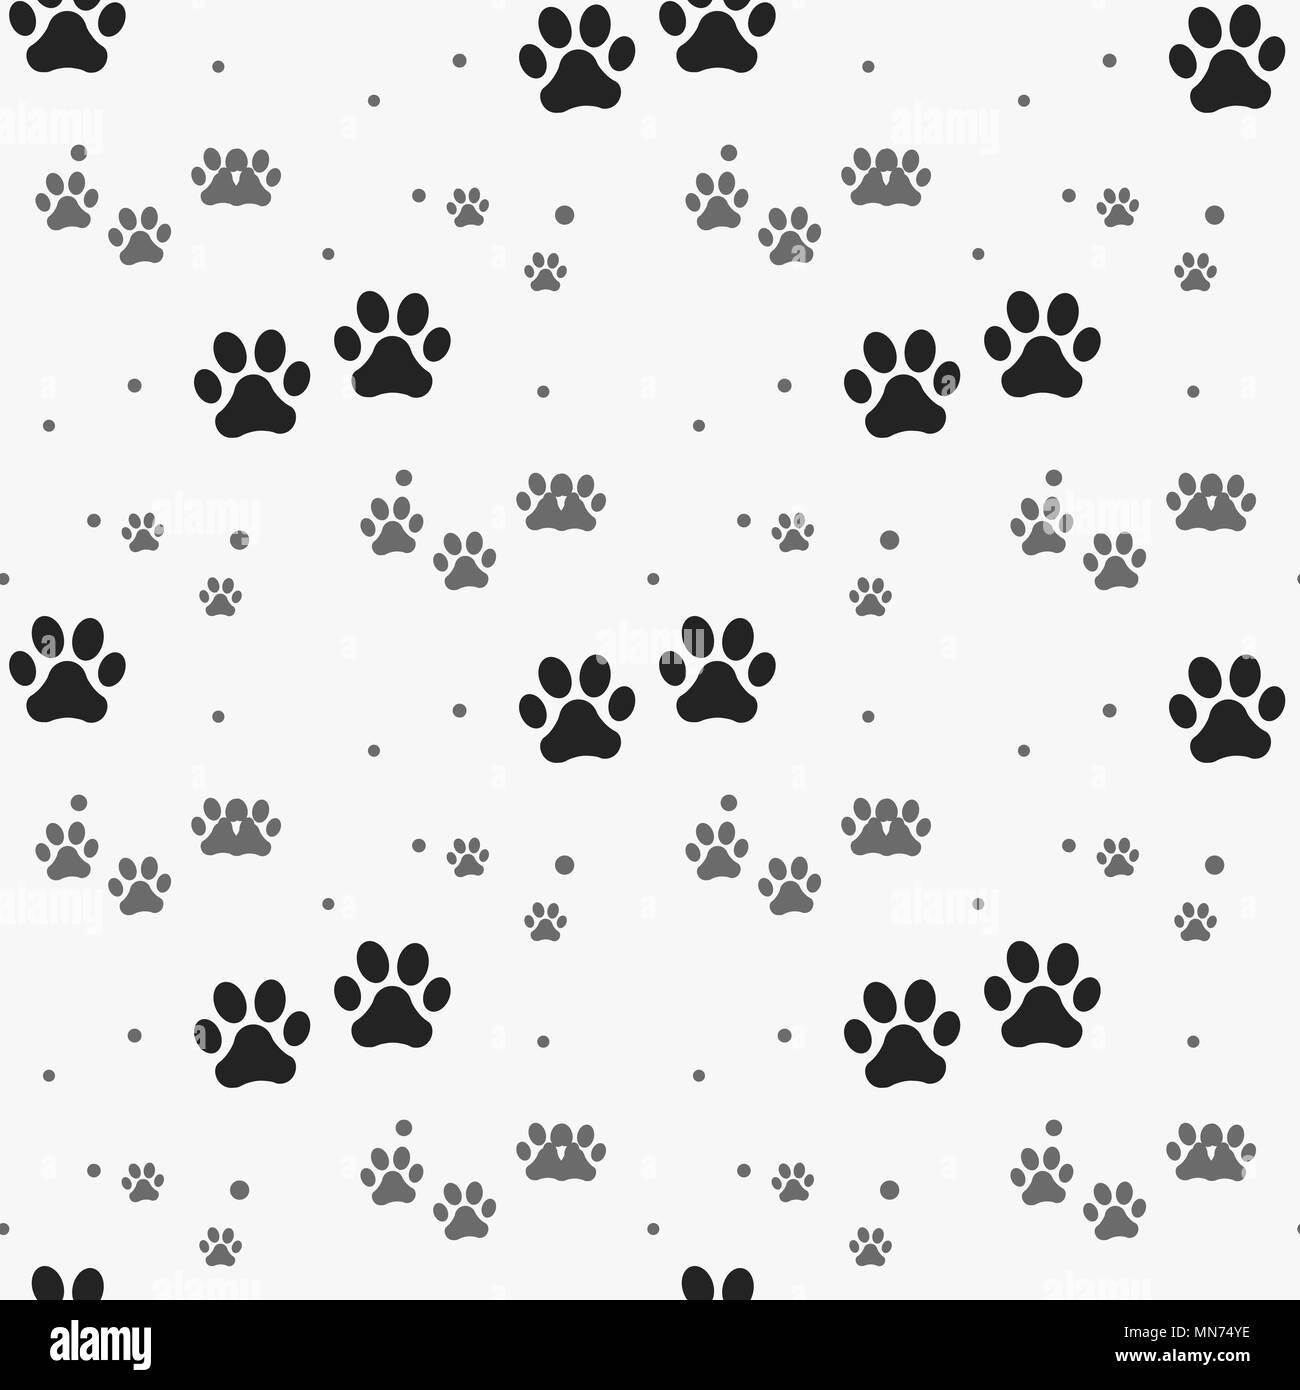 Dog paw print seamless pattern on white background eps 10 Stock